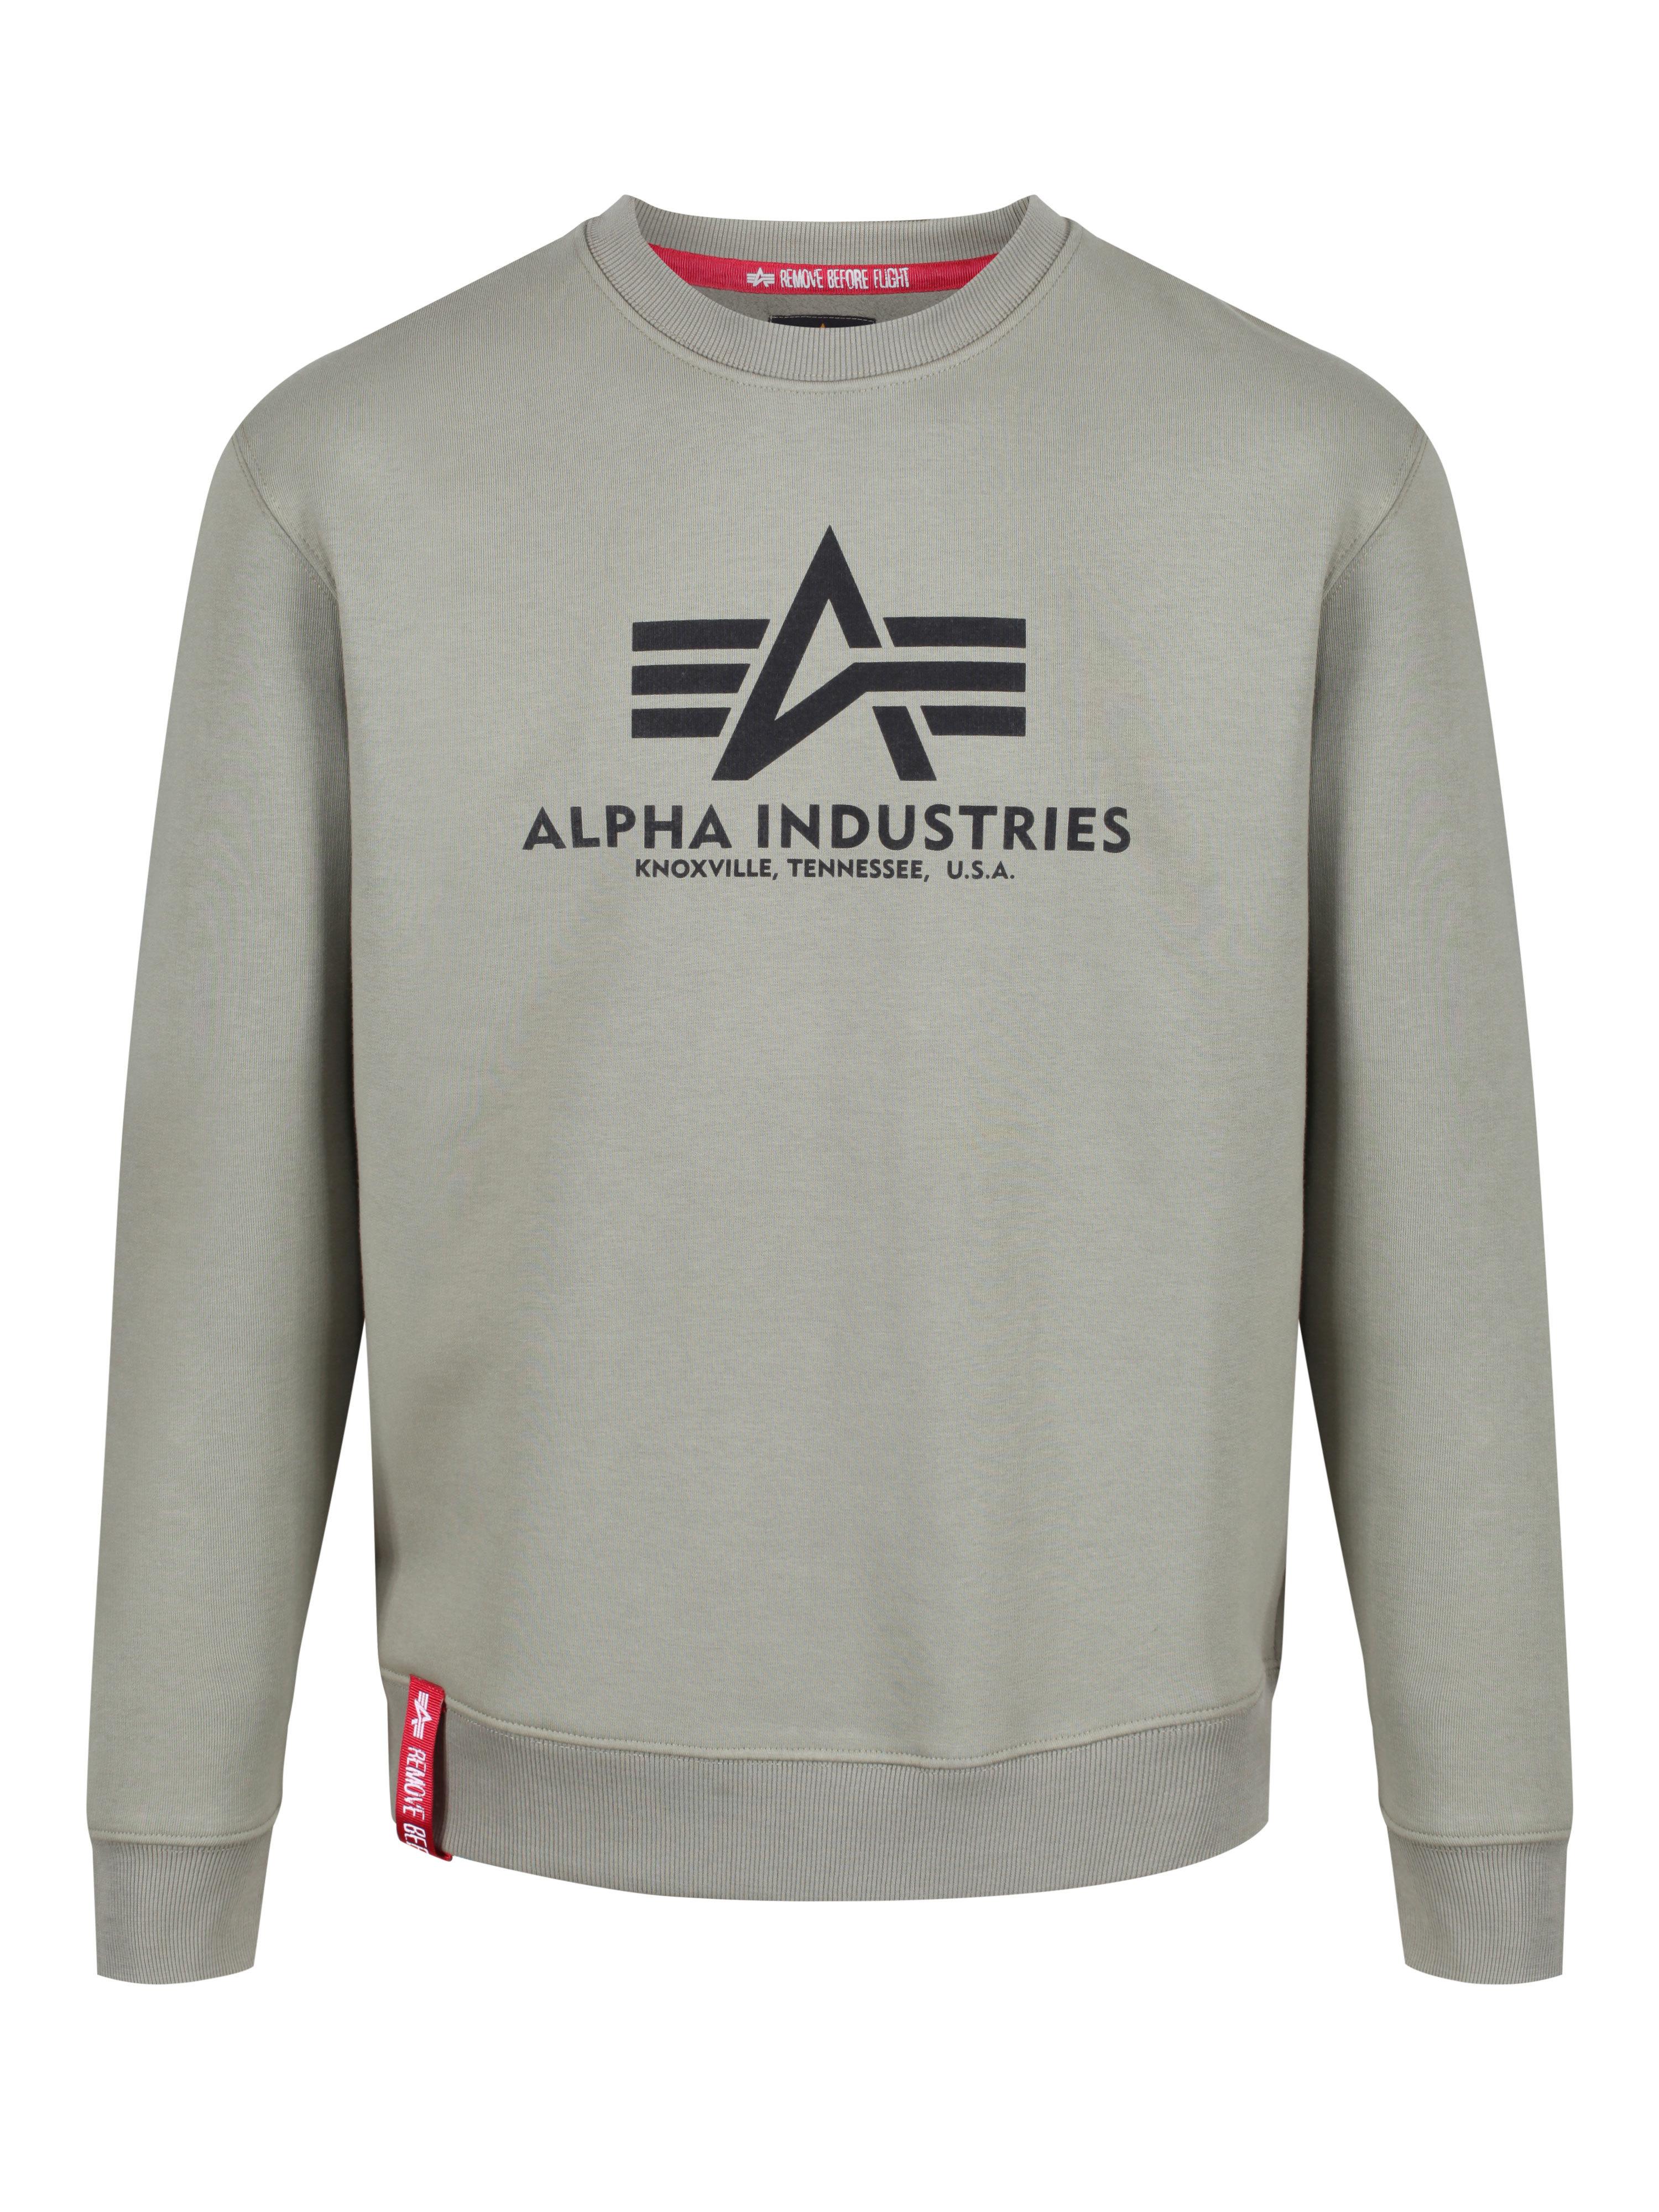 ALPHA INDUSTRIES Printed Logo Sweatshirt in Grey